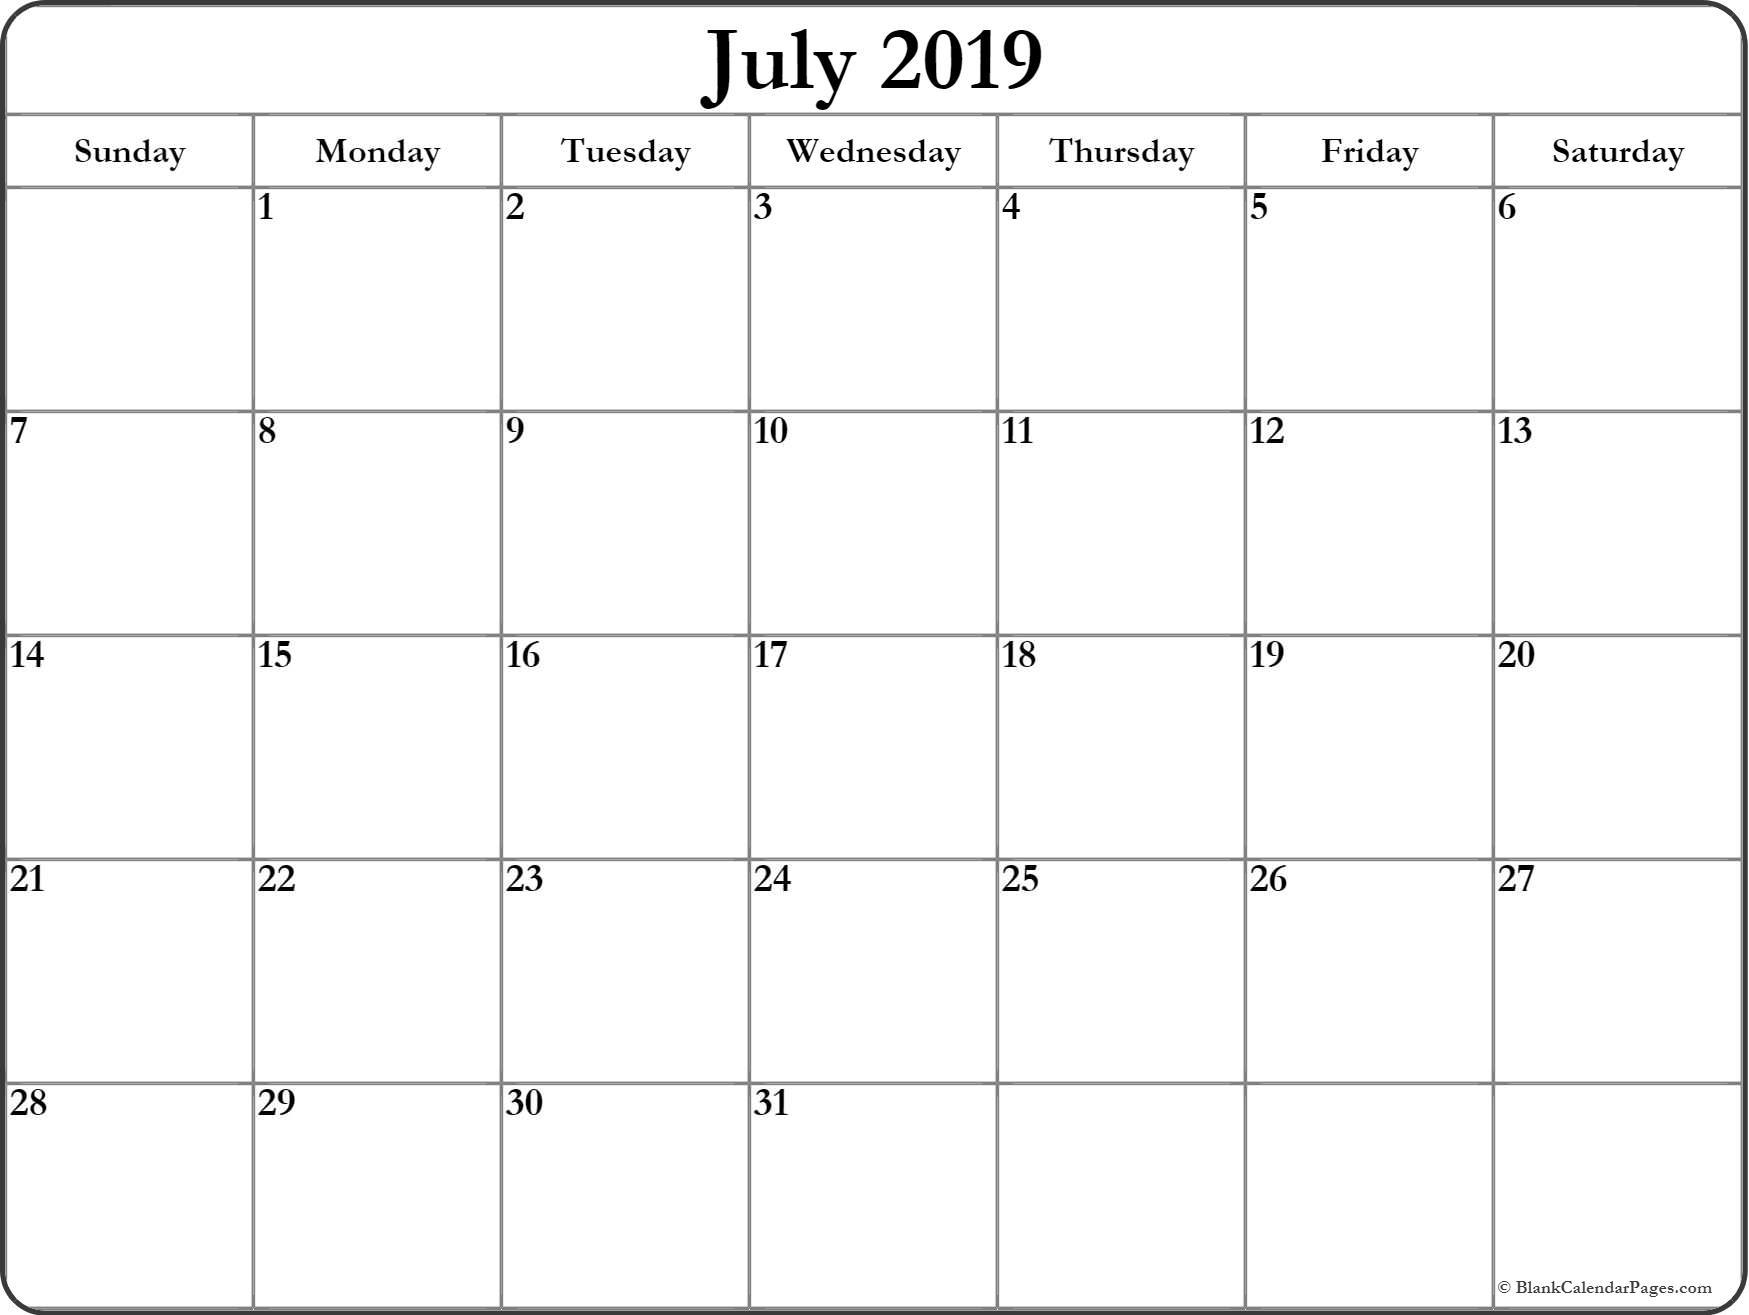 July 2019 Calendar   Free Printable Monthly Calendars pertaining to Blank July Calendar Printable